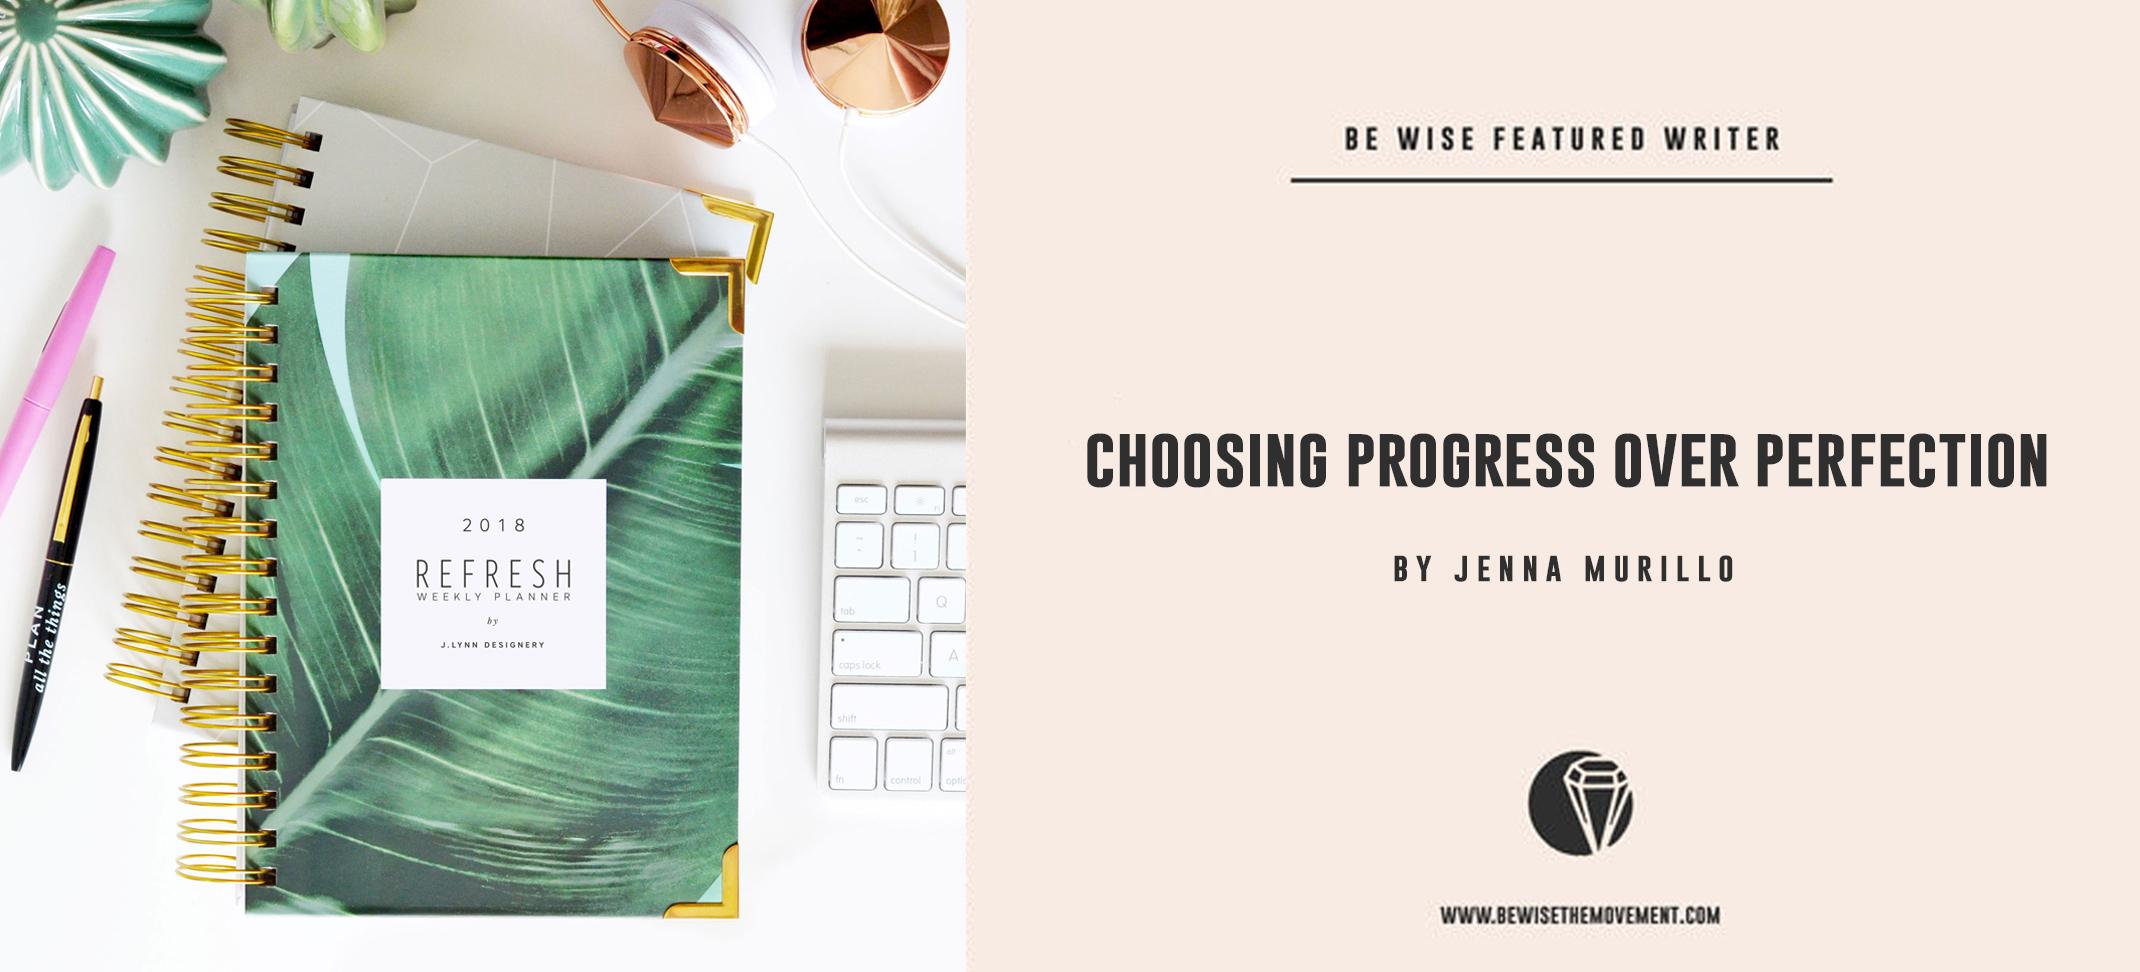 Choosing progress over perfection through goal setting